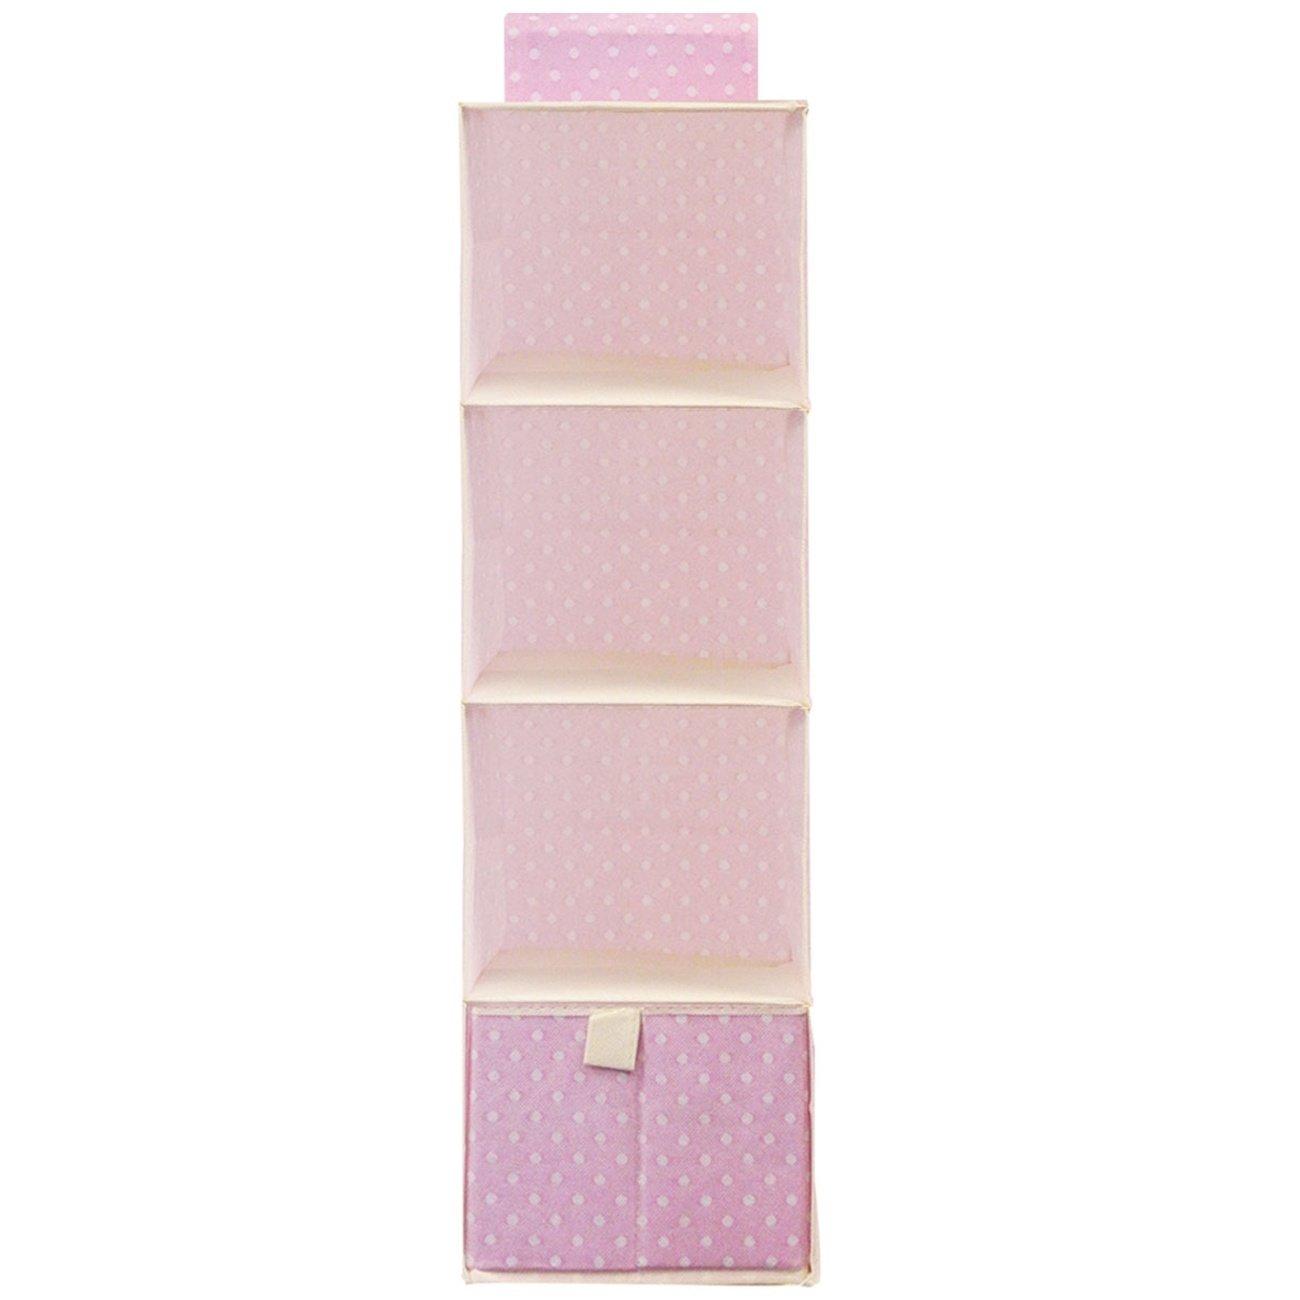 Wrapables 4-Shelf With 1 Drawer Hanging Nursery Closet Organizer Pink